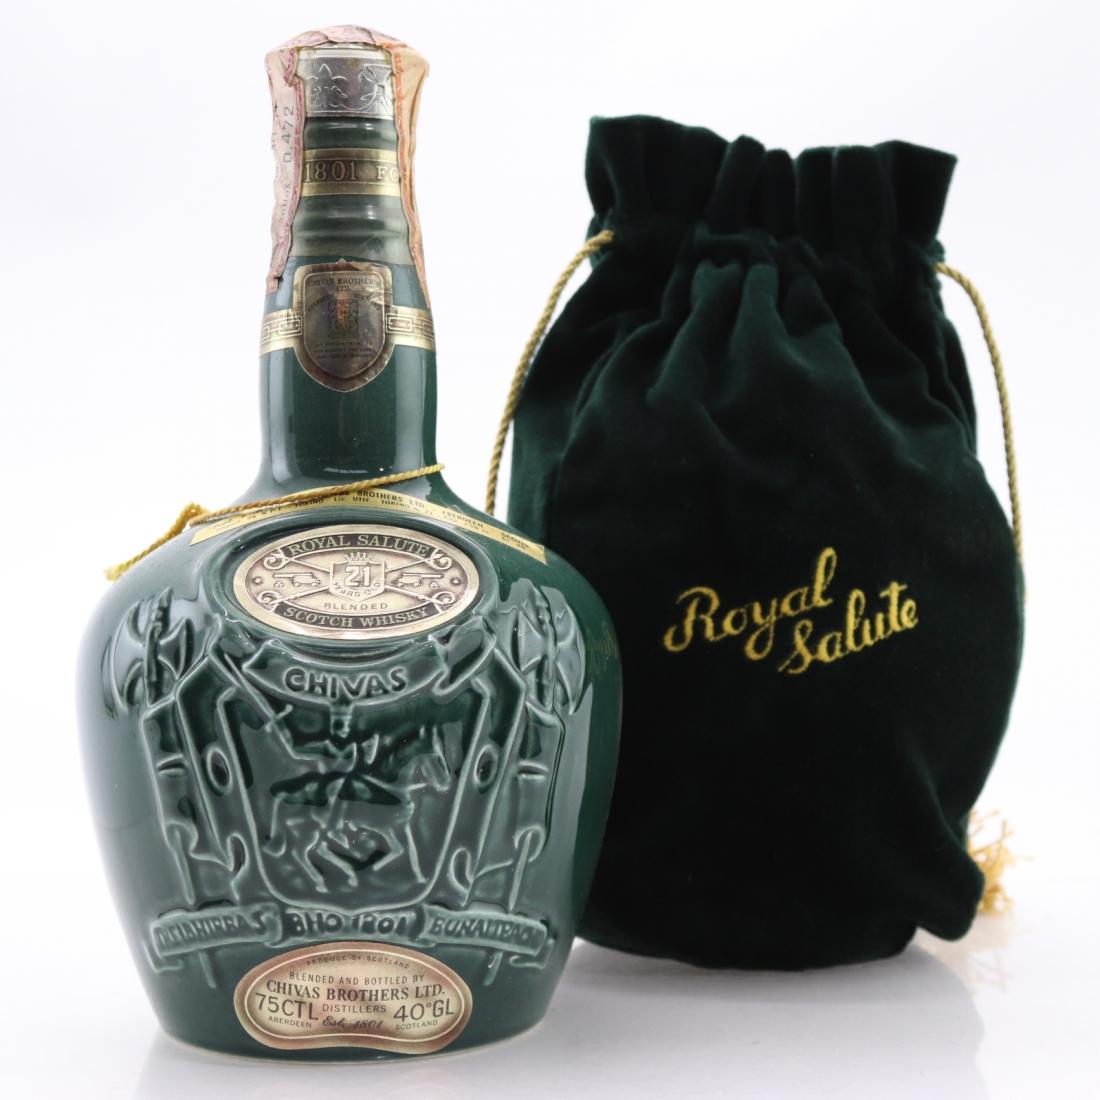 Chivas 21 Year Old Royal Salute 1970s / Emerald Flagon